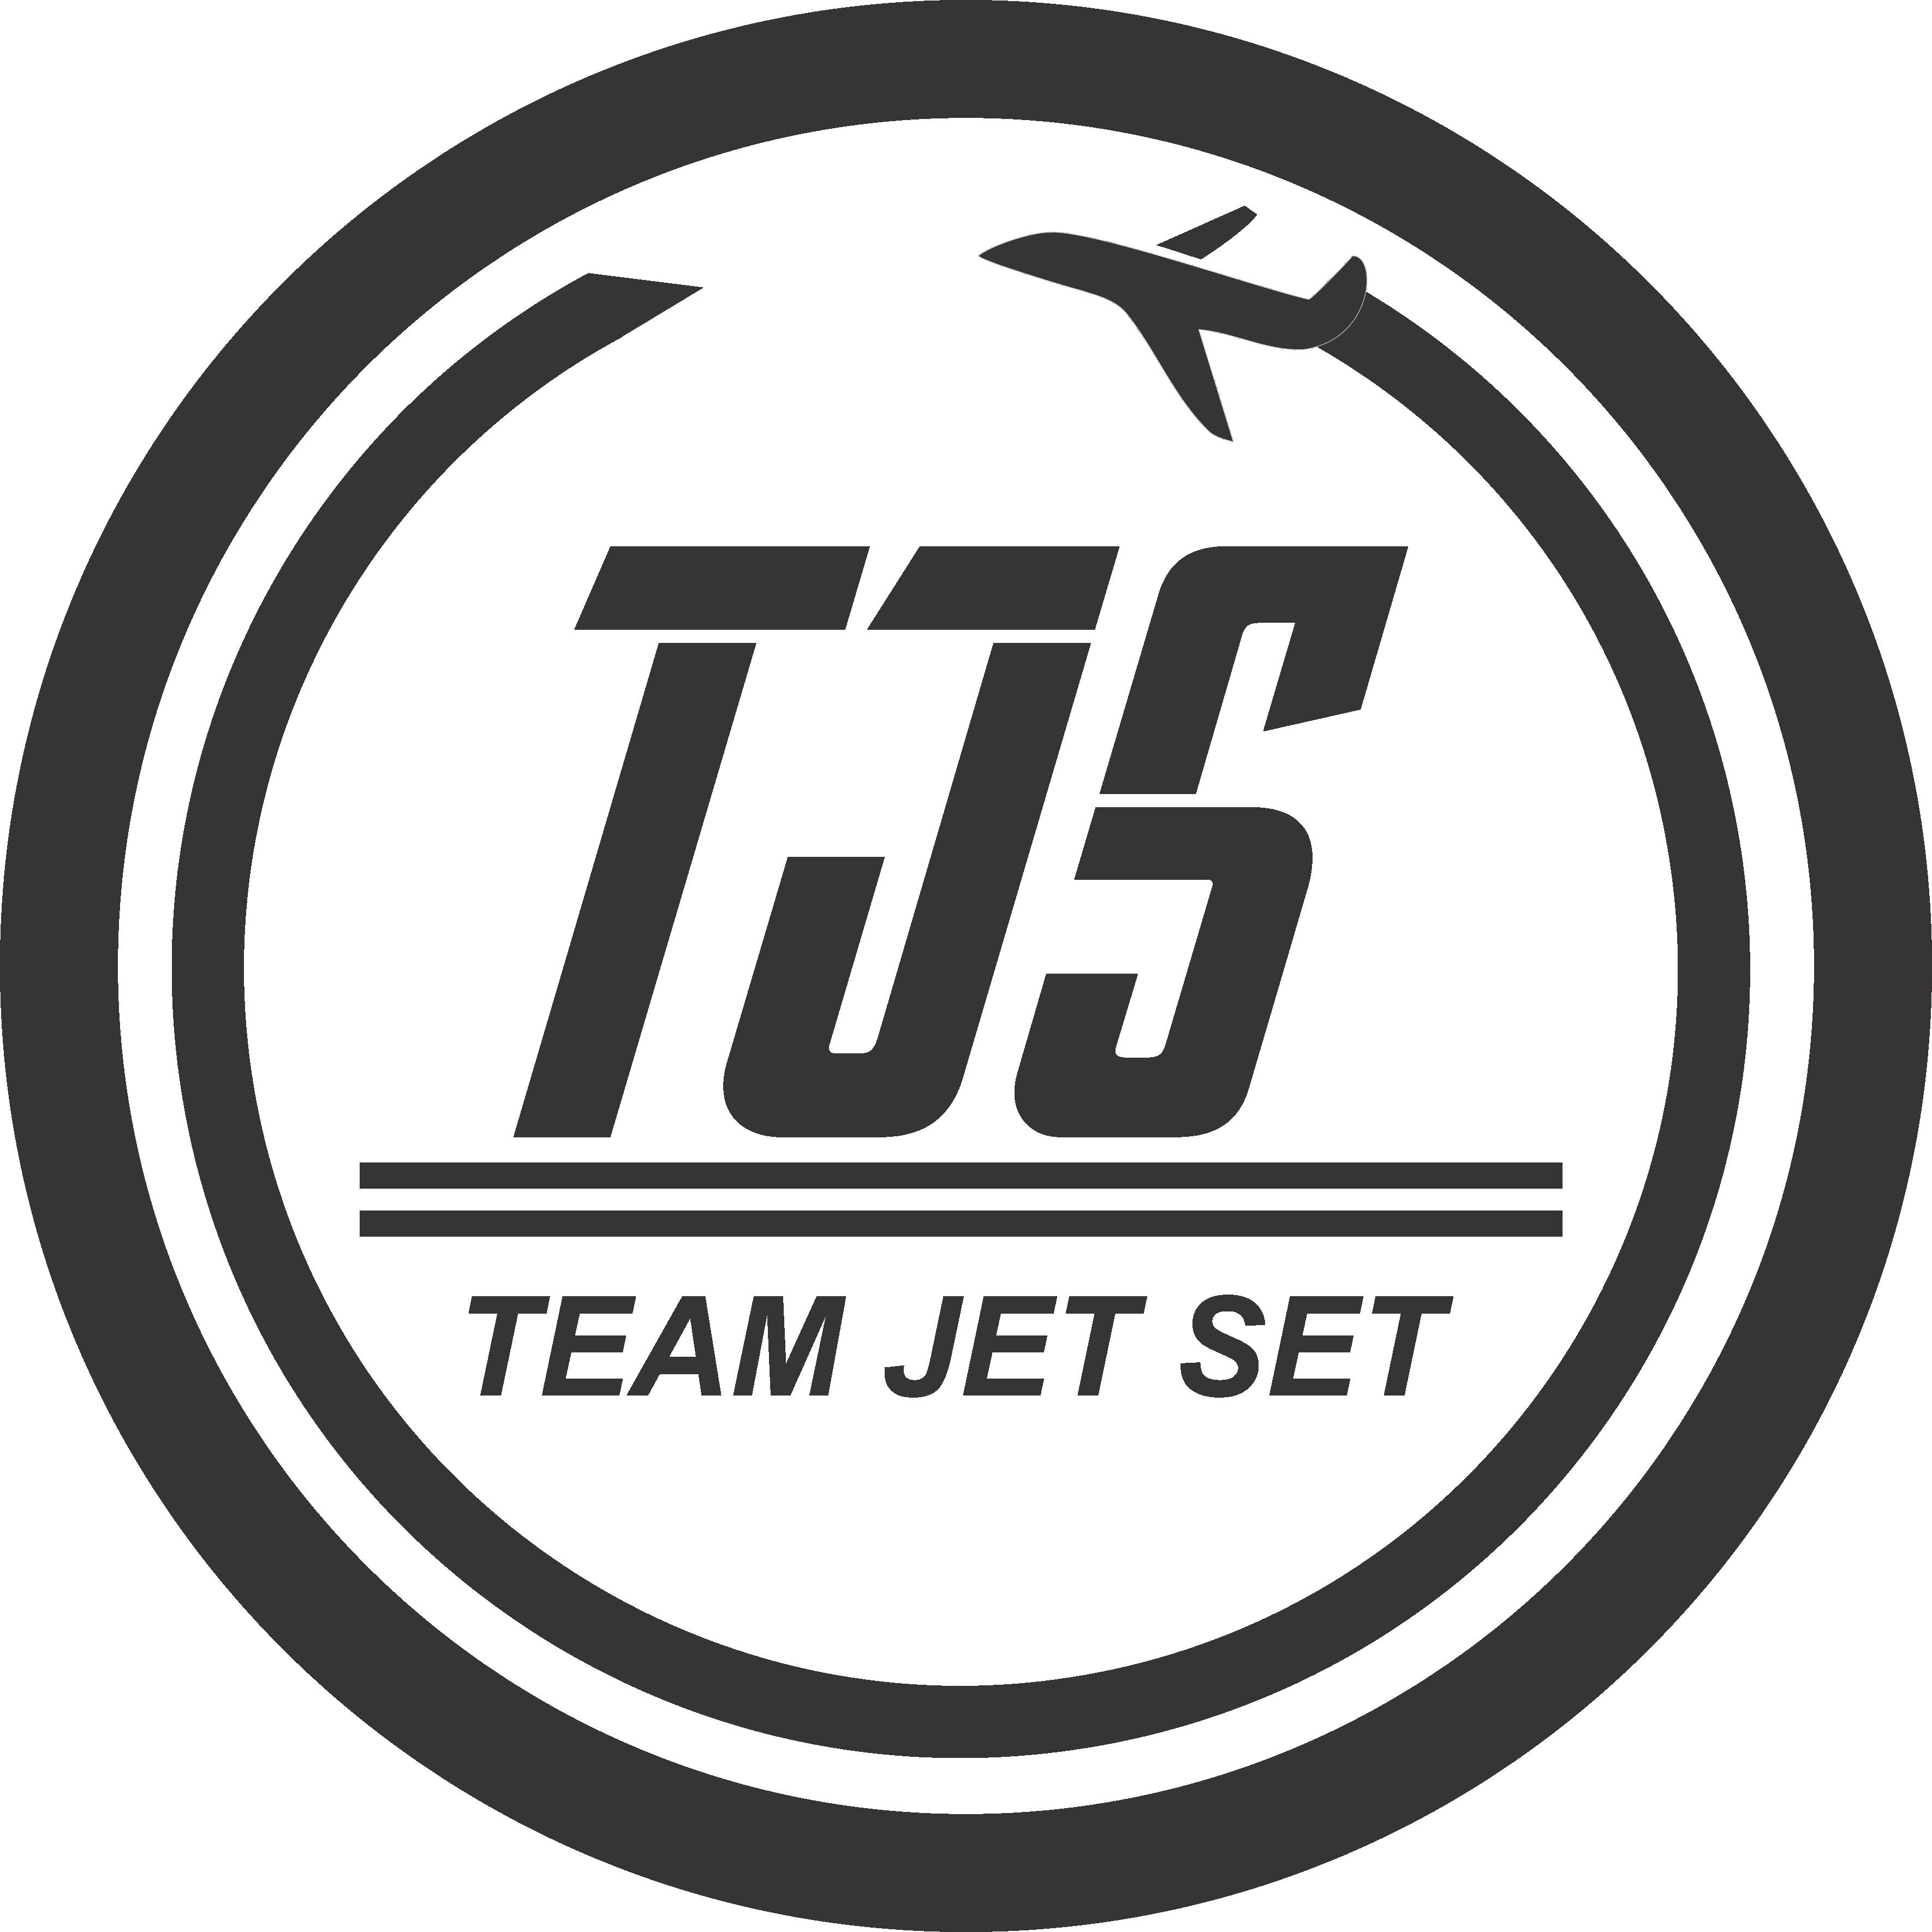 Team Jet Set